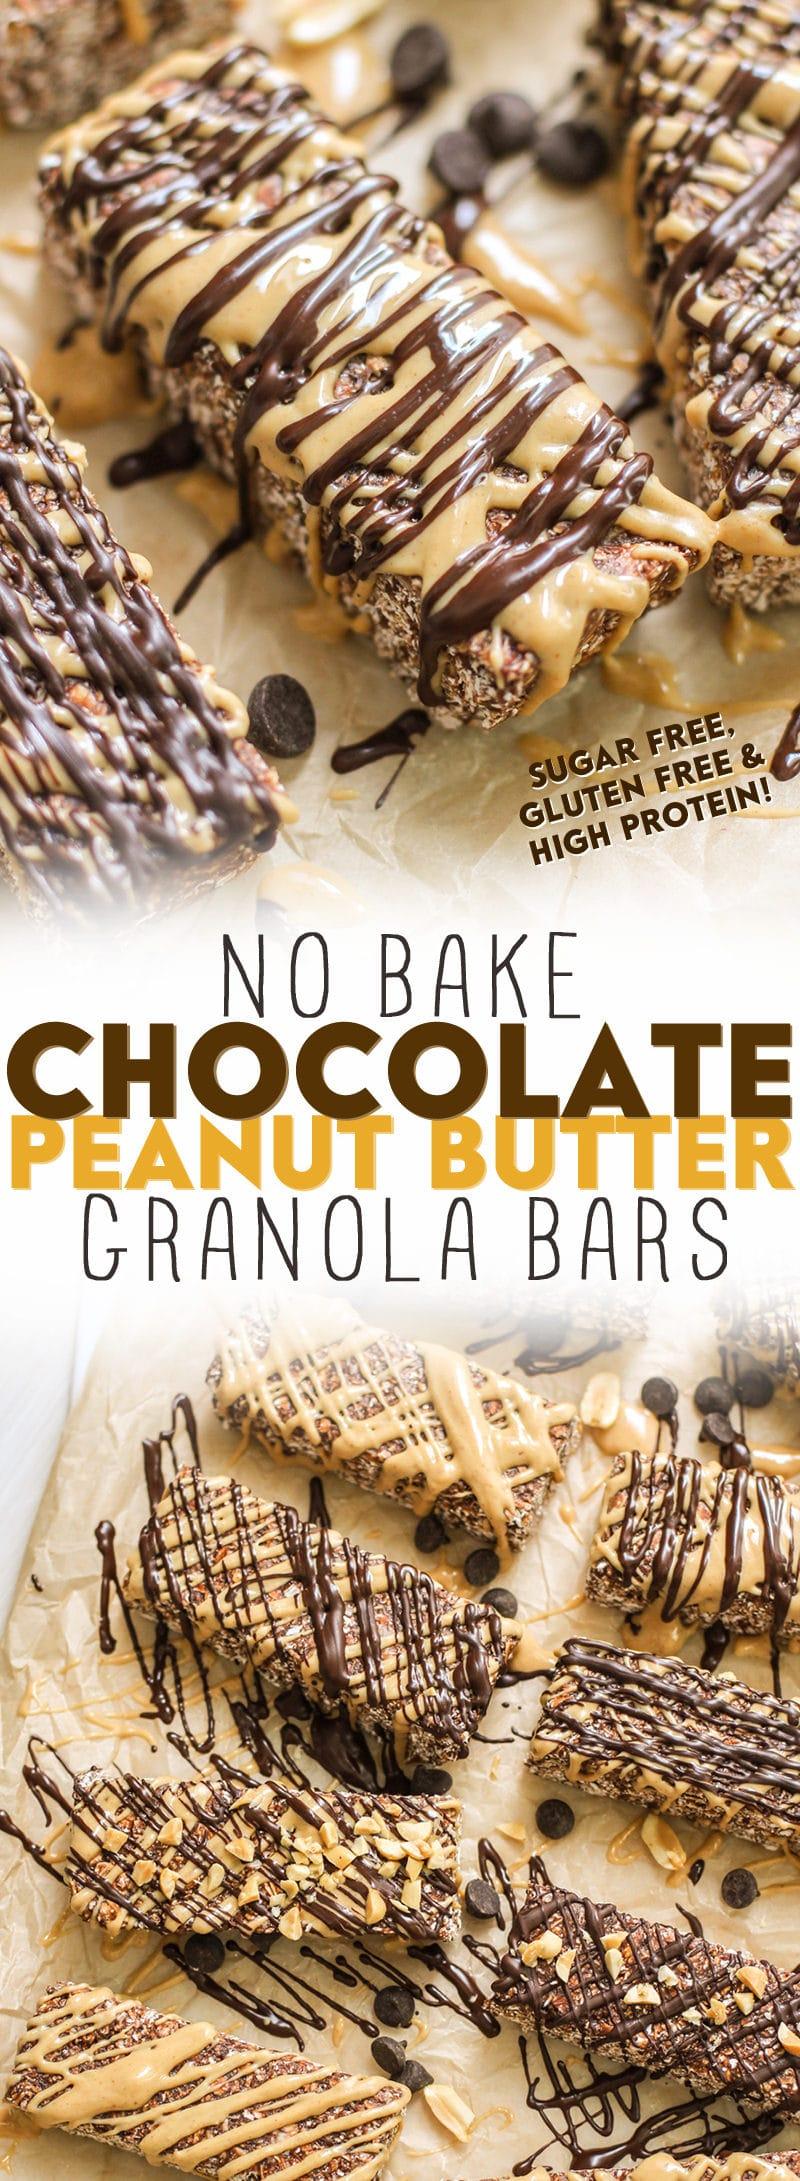 Healthy No-Bake Chocolate Peanut Butter Granola Bars (refined sugar free, high protein, high fiber, gluten free) - Healthy Dessert Recipes at Desserts with Benefits